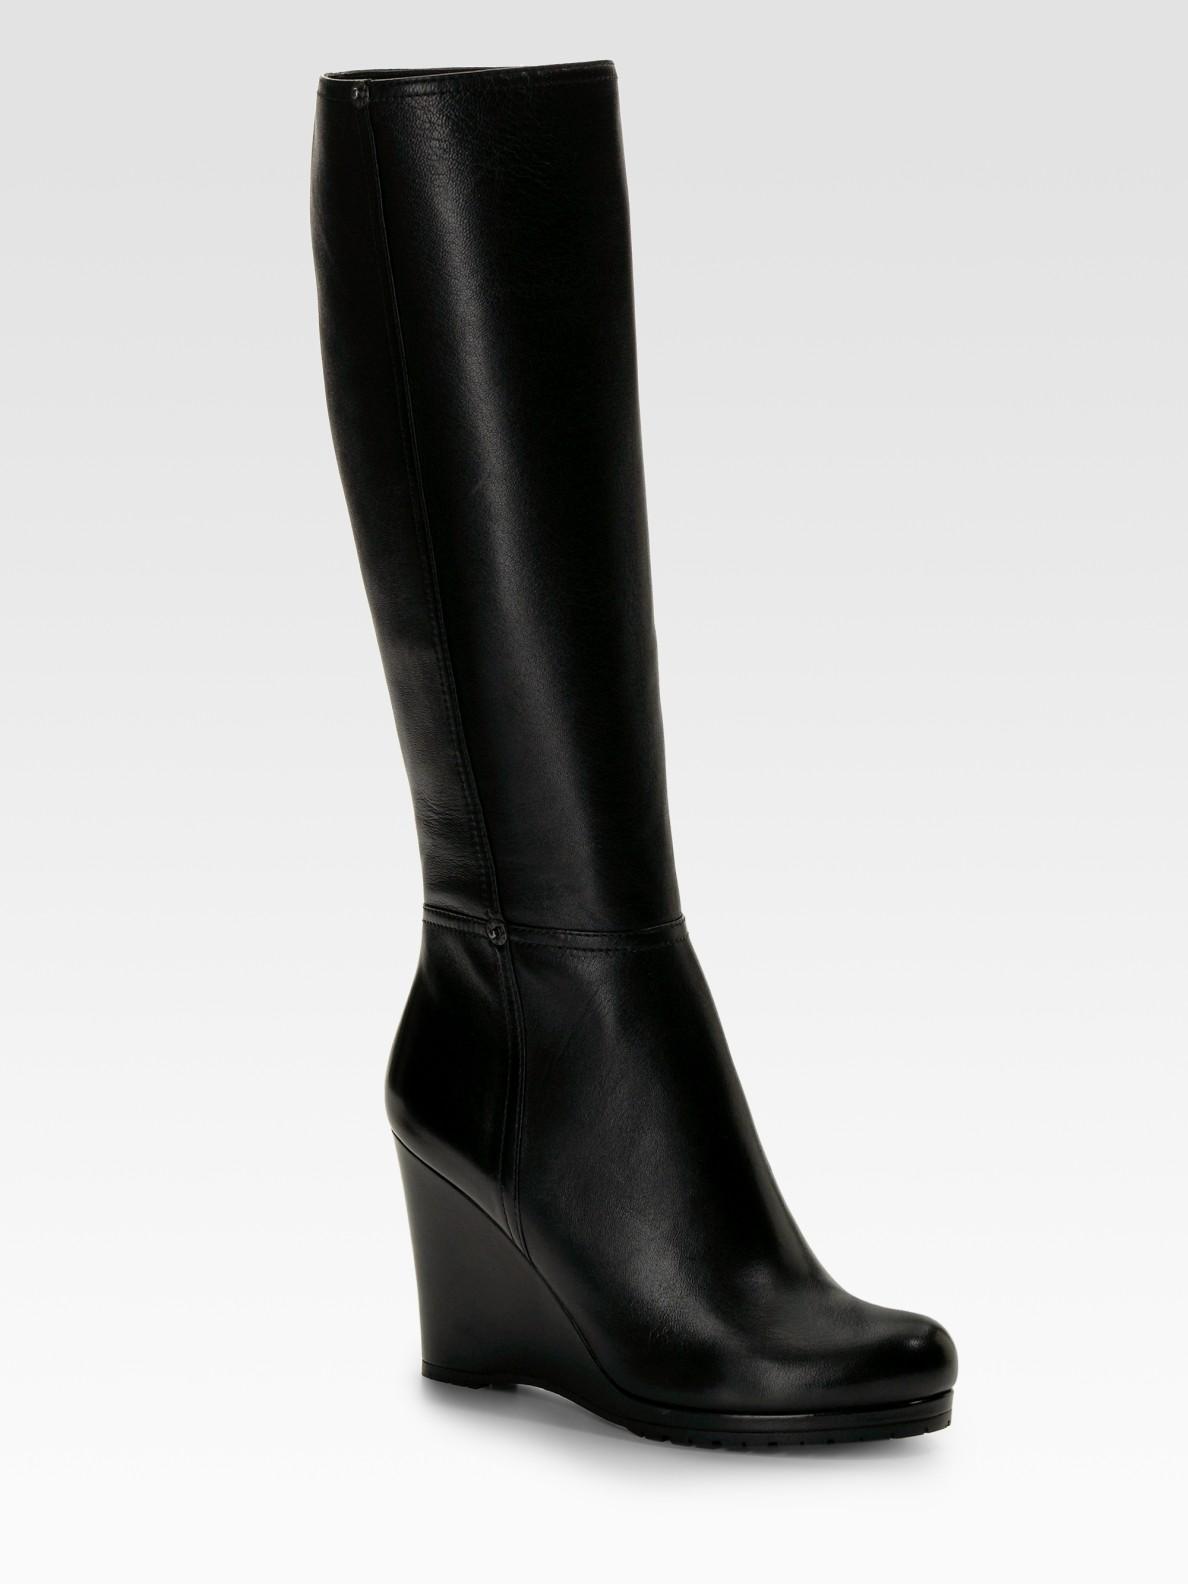 Prada Tall Wedge Boots in Black